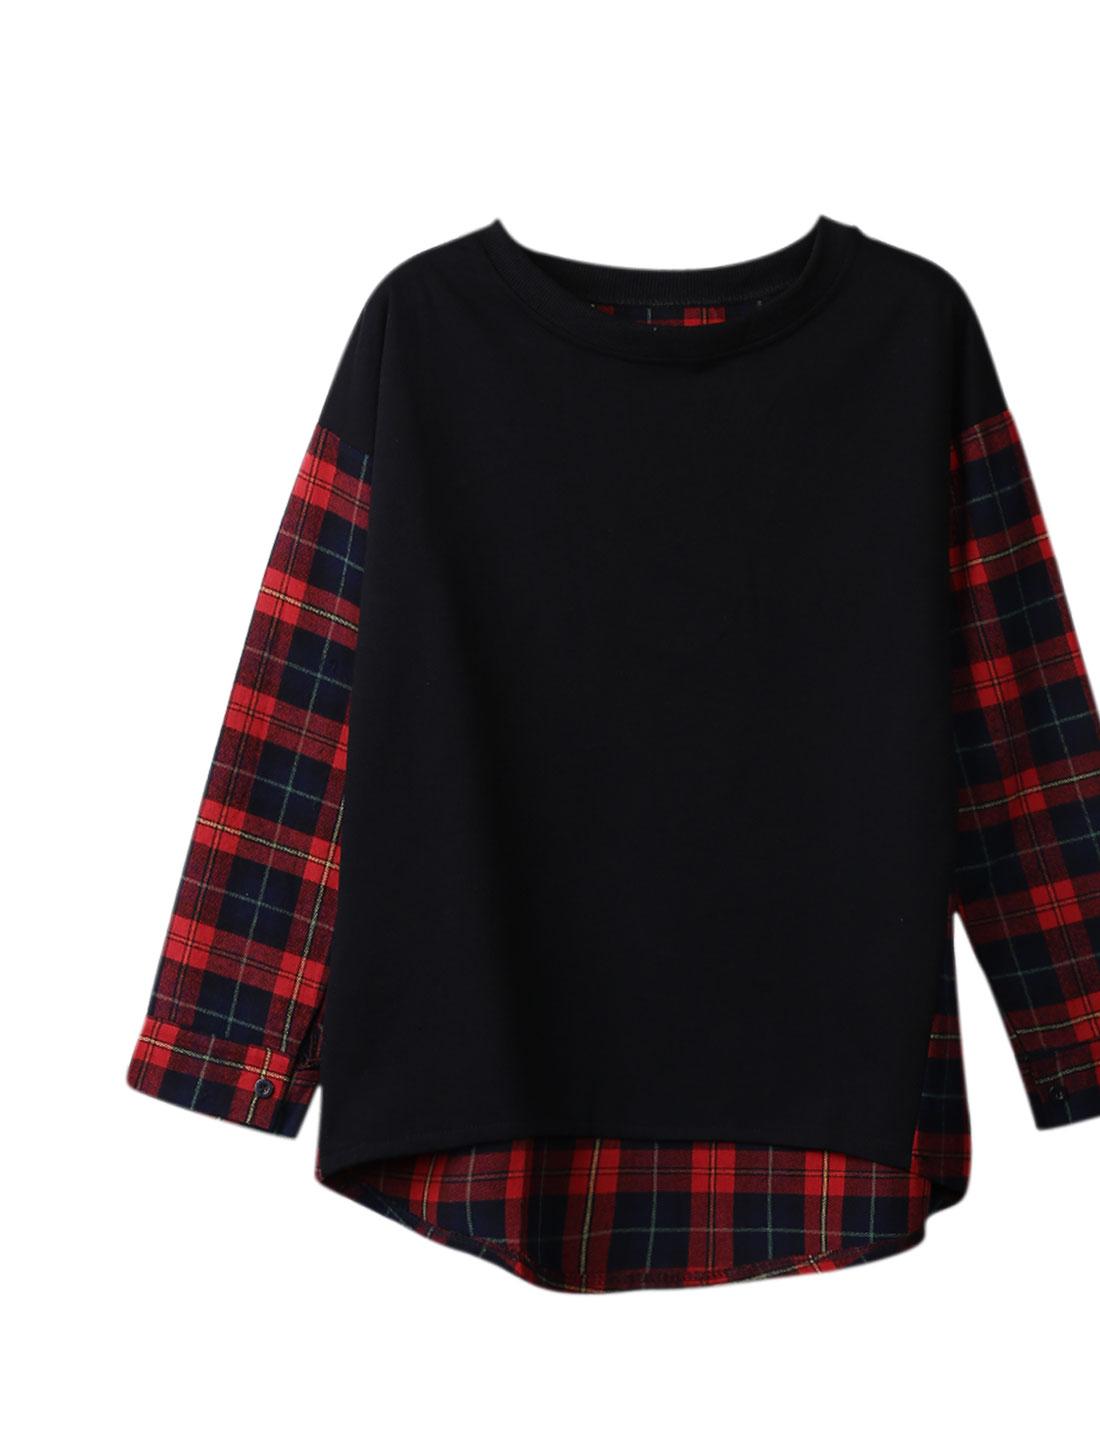 Ladies Black Red Checks Prints Slipover Splice Button Cuffs Leisure Top S